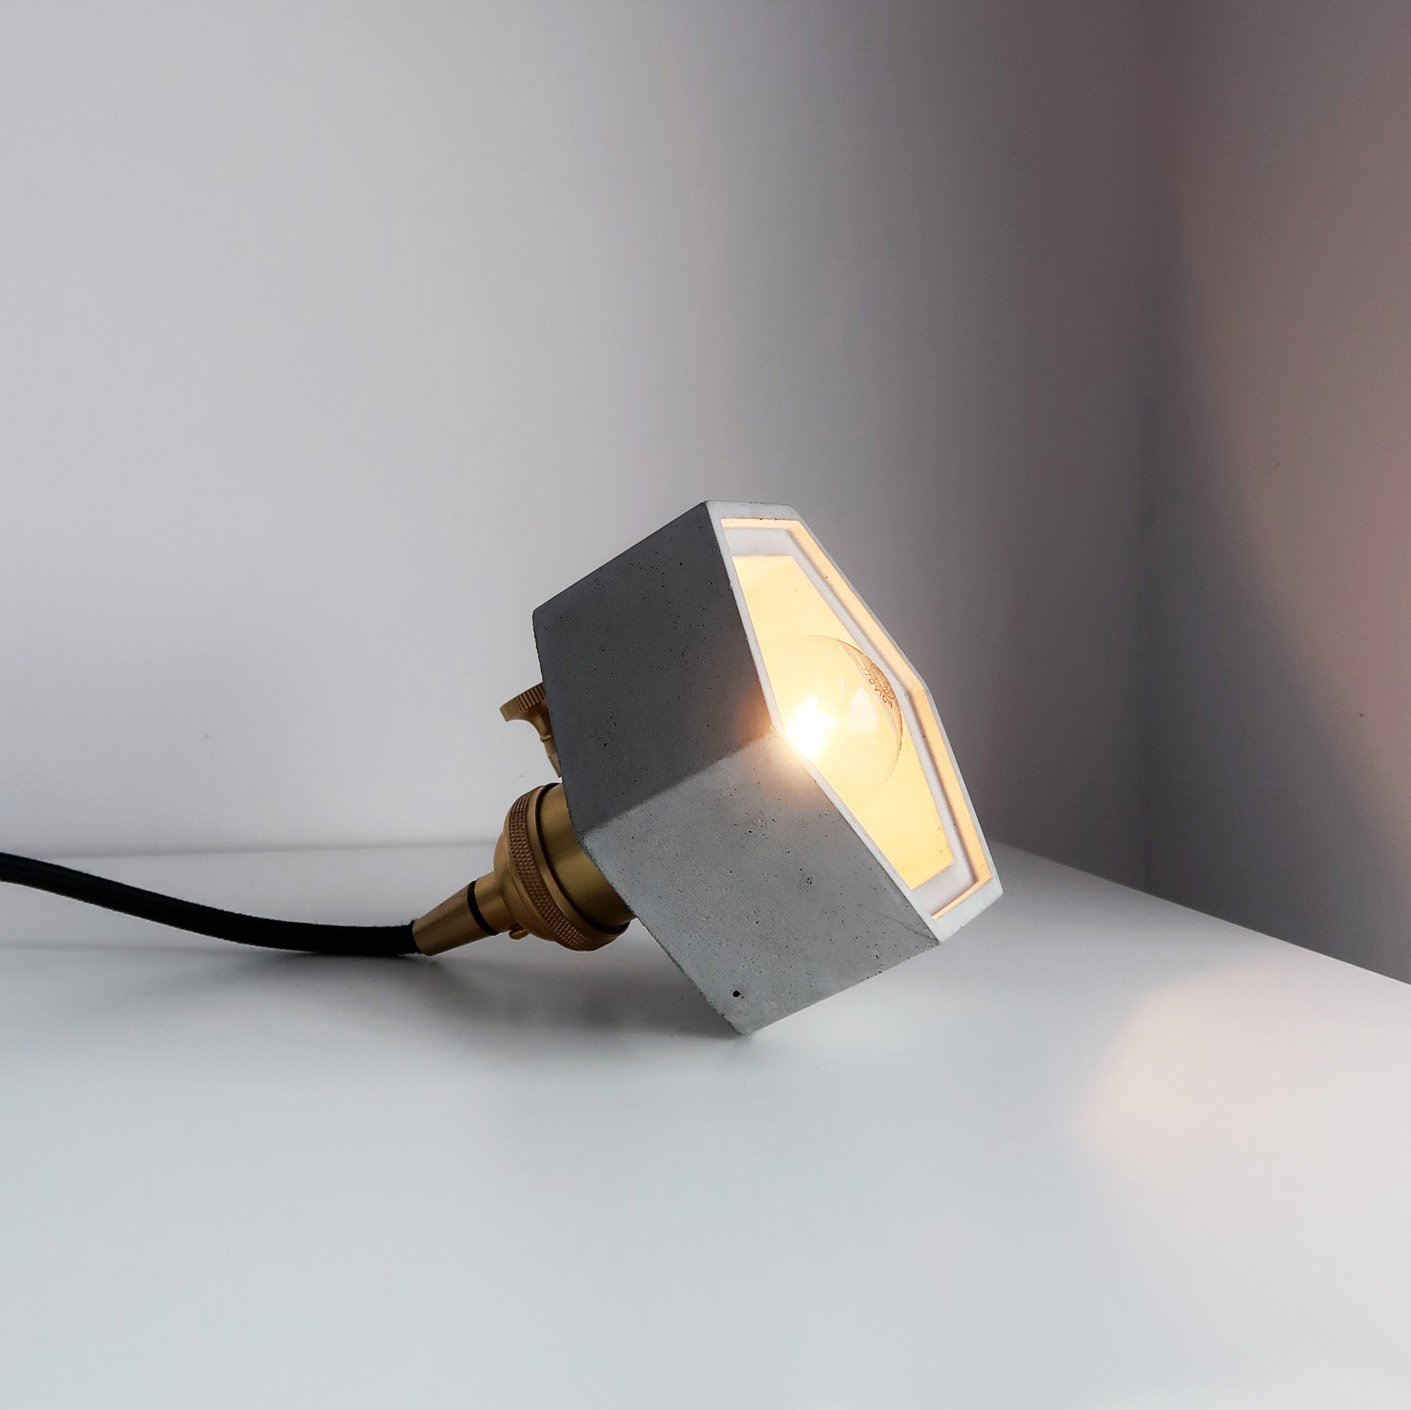 HALO 光圈黃銅六邊型斜角水泥夜燈 / Brass concrete night light